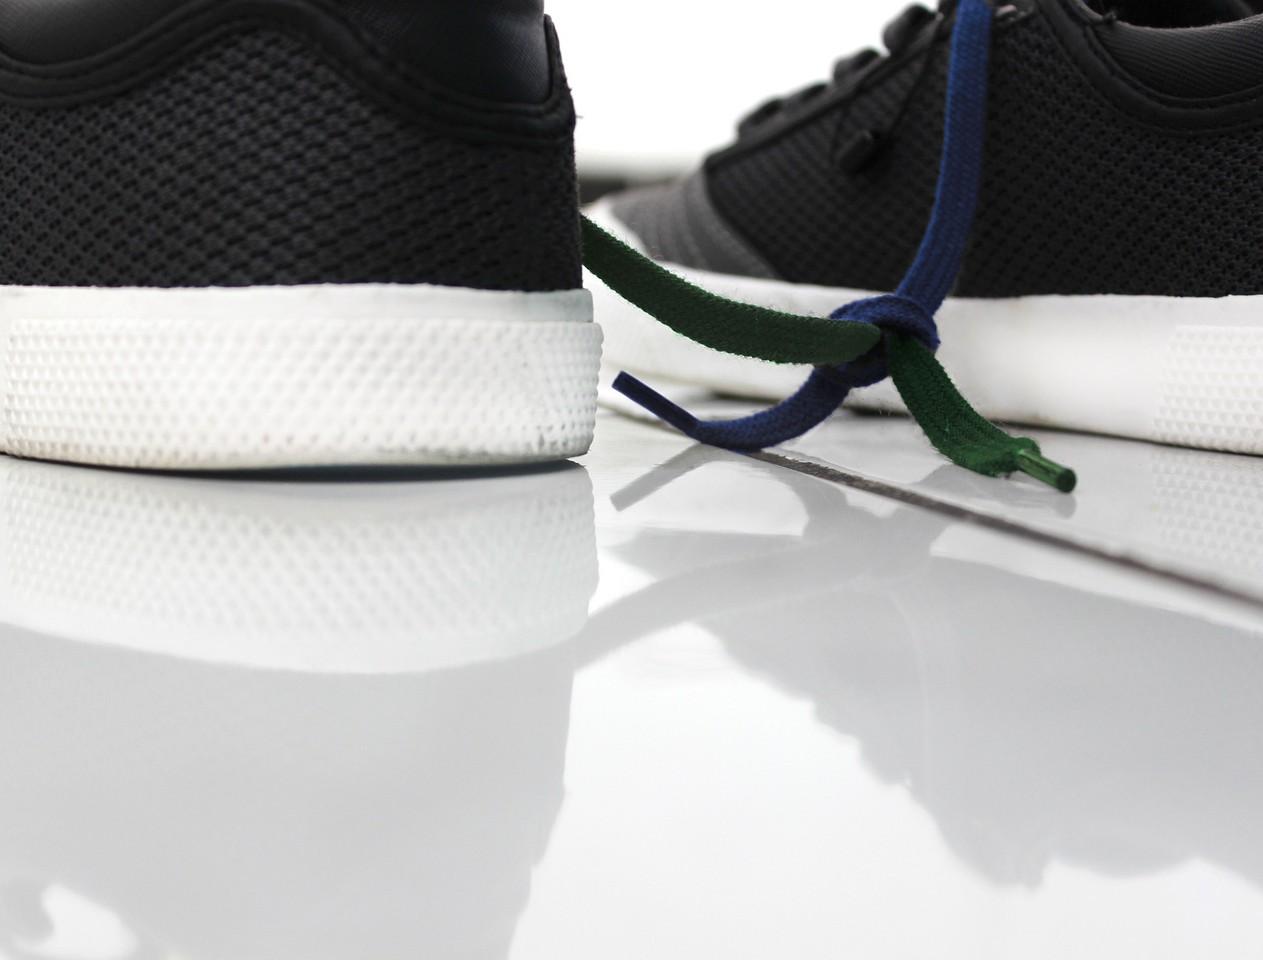 shoes-1751928_1920.jpg